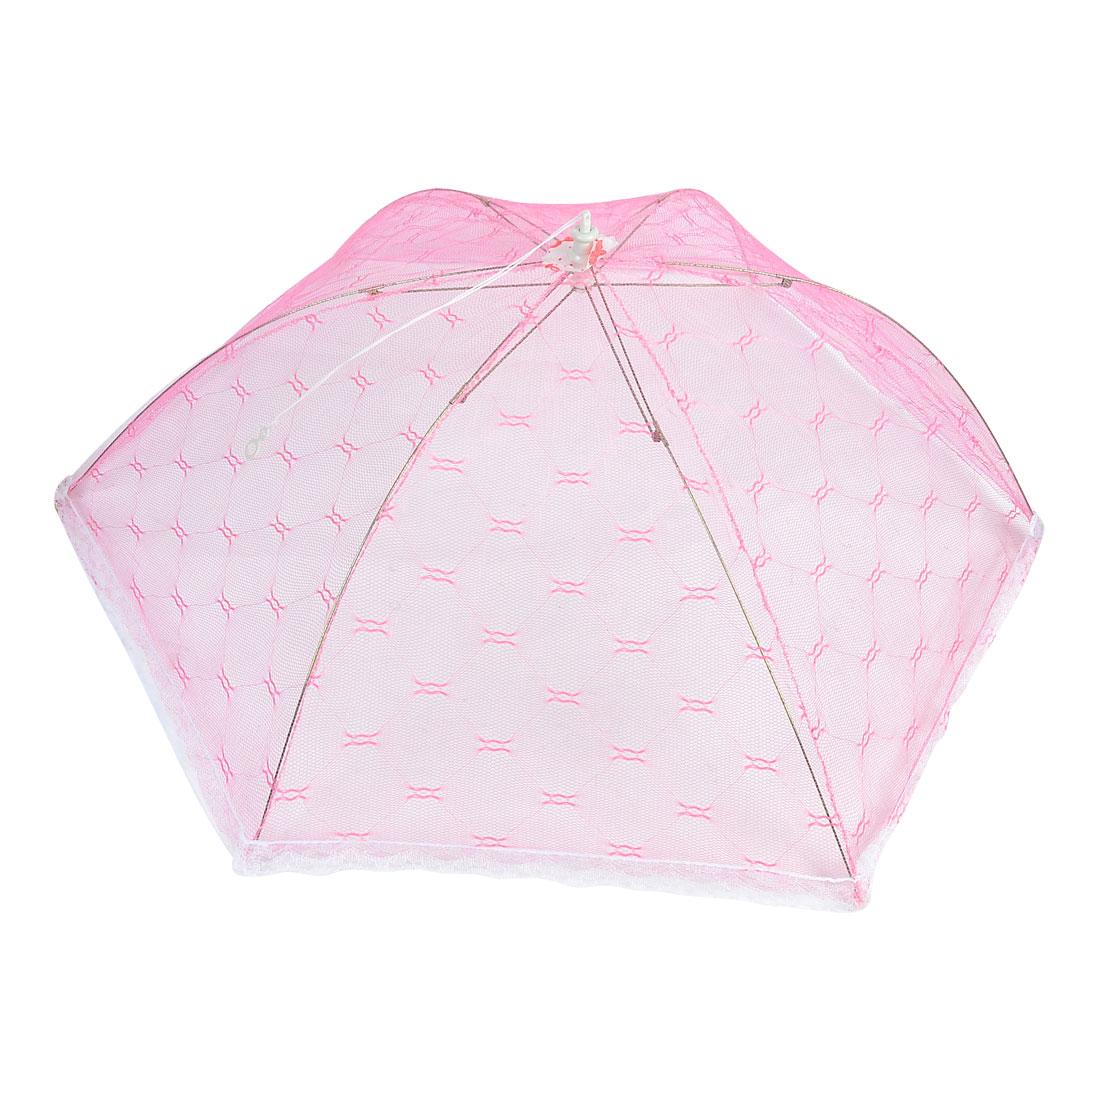 Restaurant Home Kitchen Nylon Mesh Net Dessert Dish Food Cover Umbrella Pink